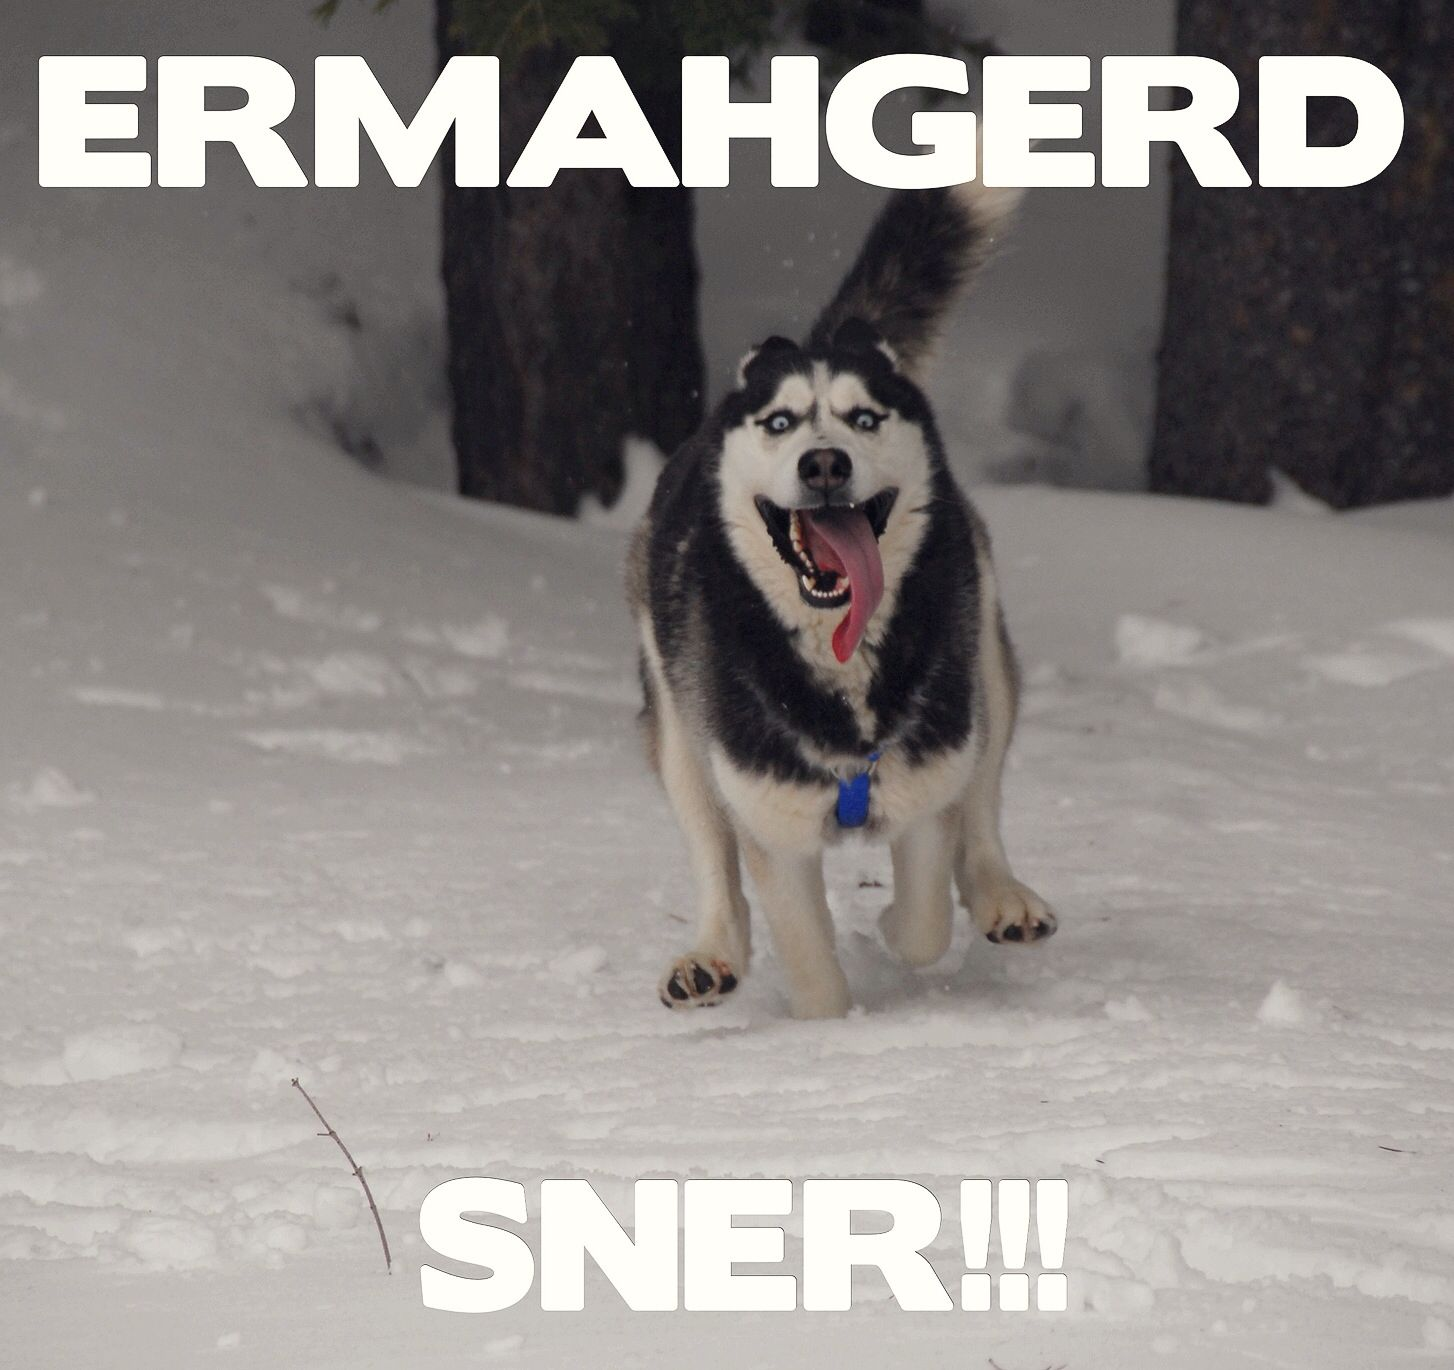 Ermahgerd sner!!! | Seriously though | Pinterest